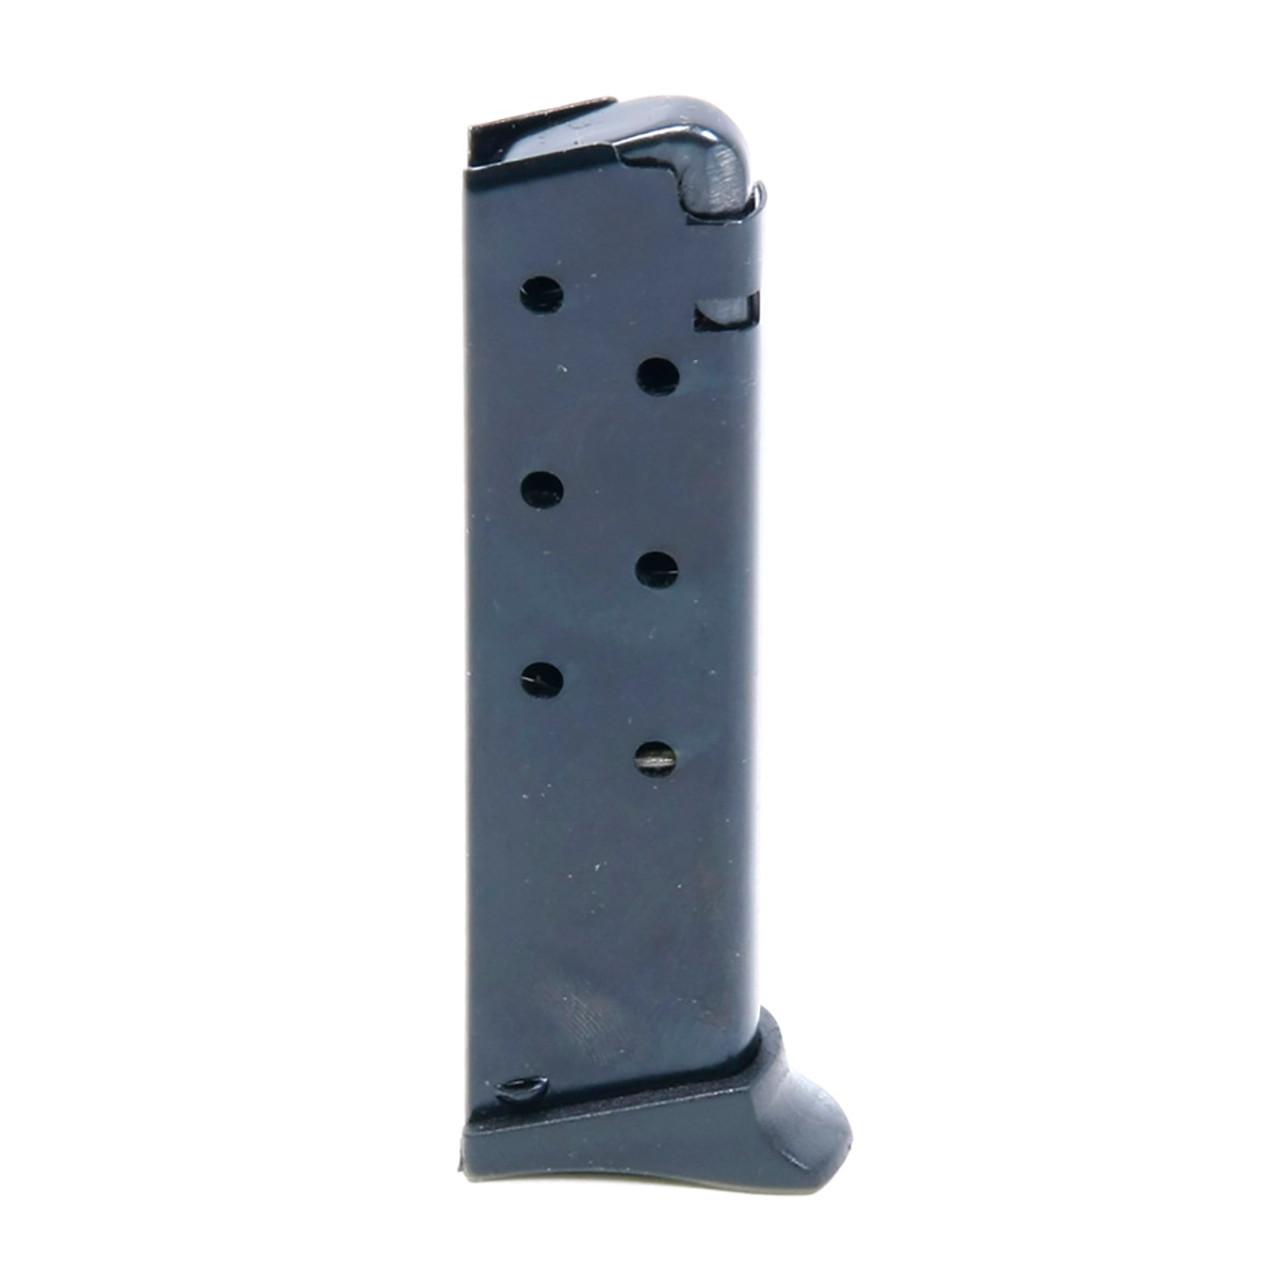 Bersa® 383A, Series 95, Thunder 380, and Firestorm® .380 ACP (7) Rd - Blue Steel